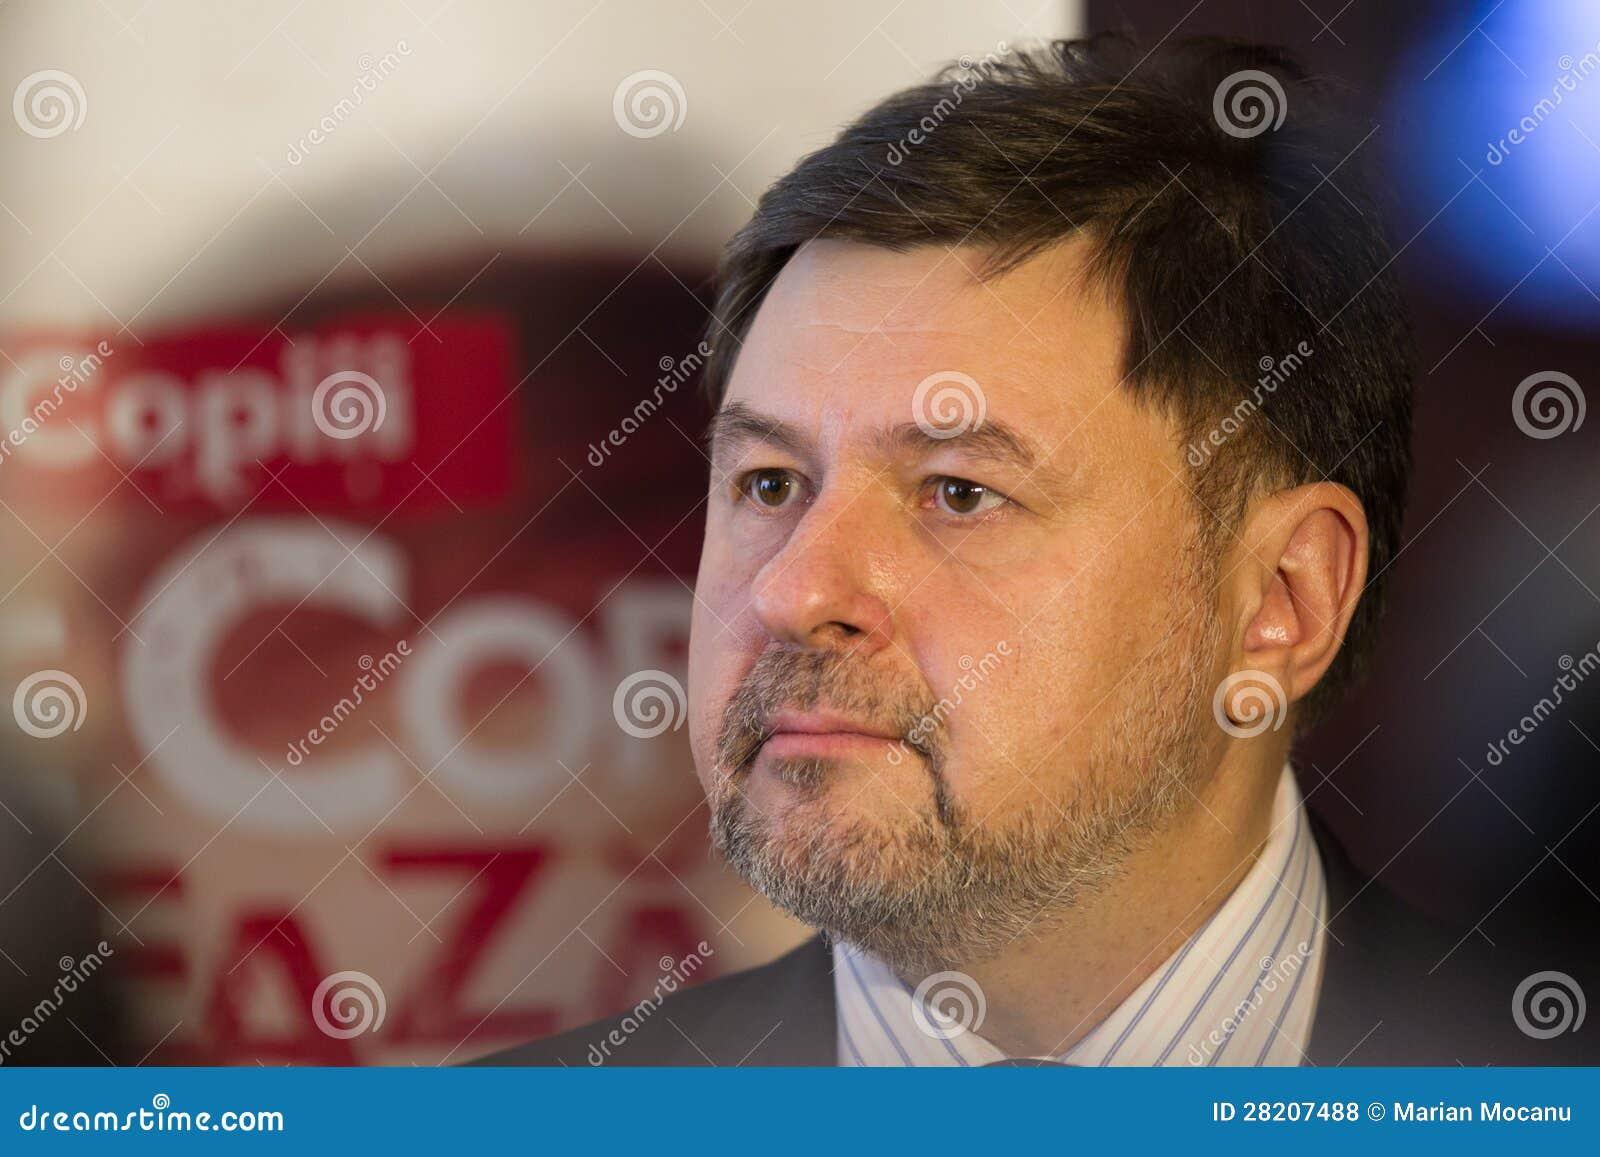 Alexandru Rafila Editorial Stock Image - Image: 28207499  |Alexandru Rafila